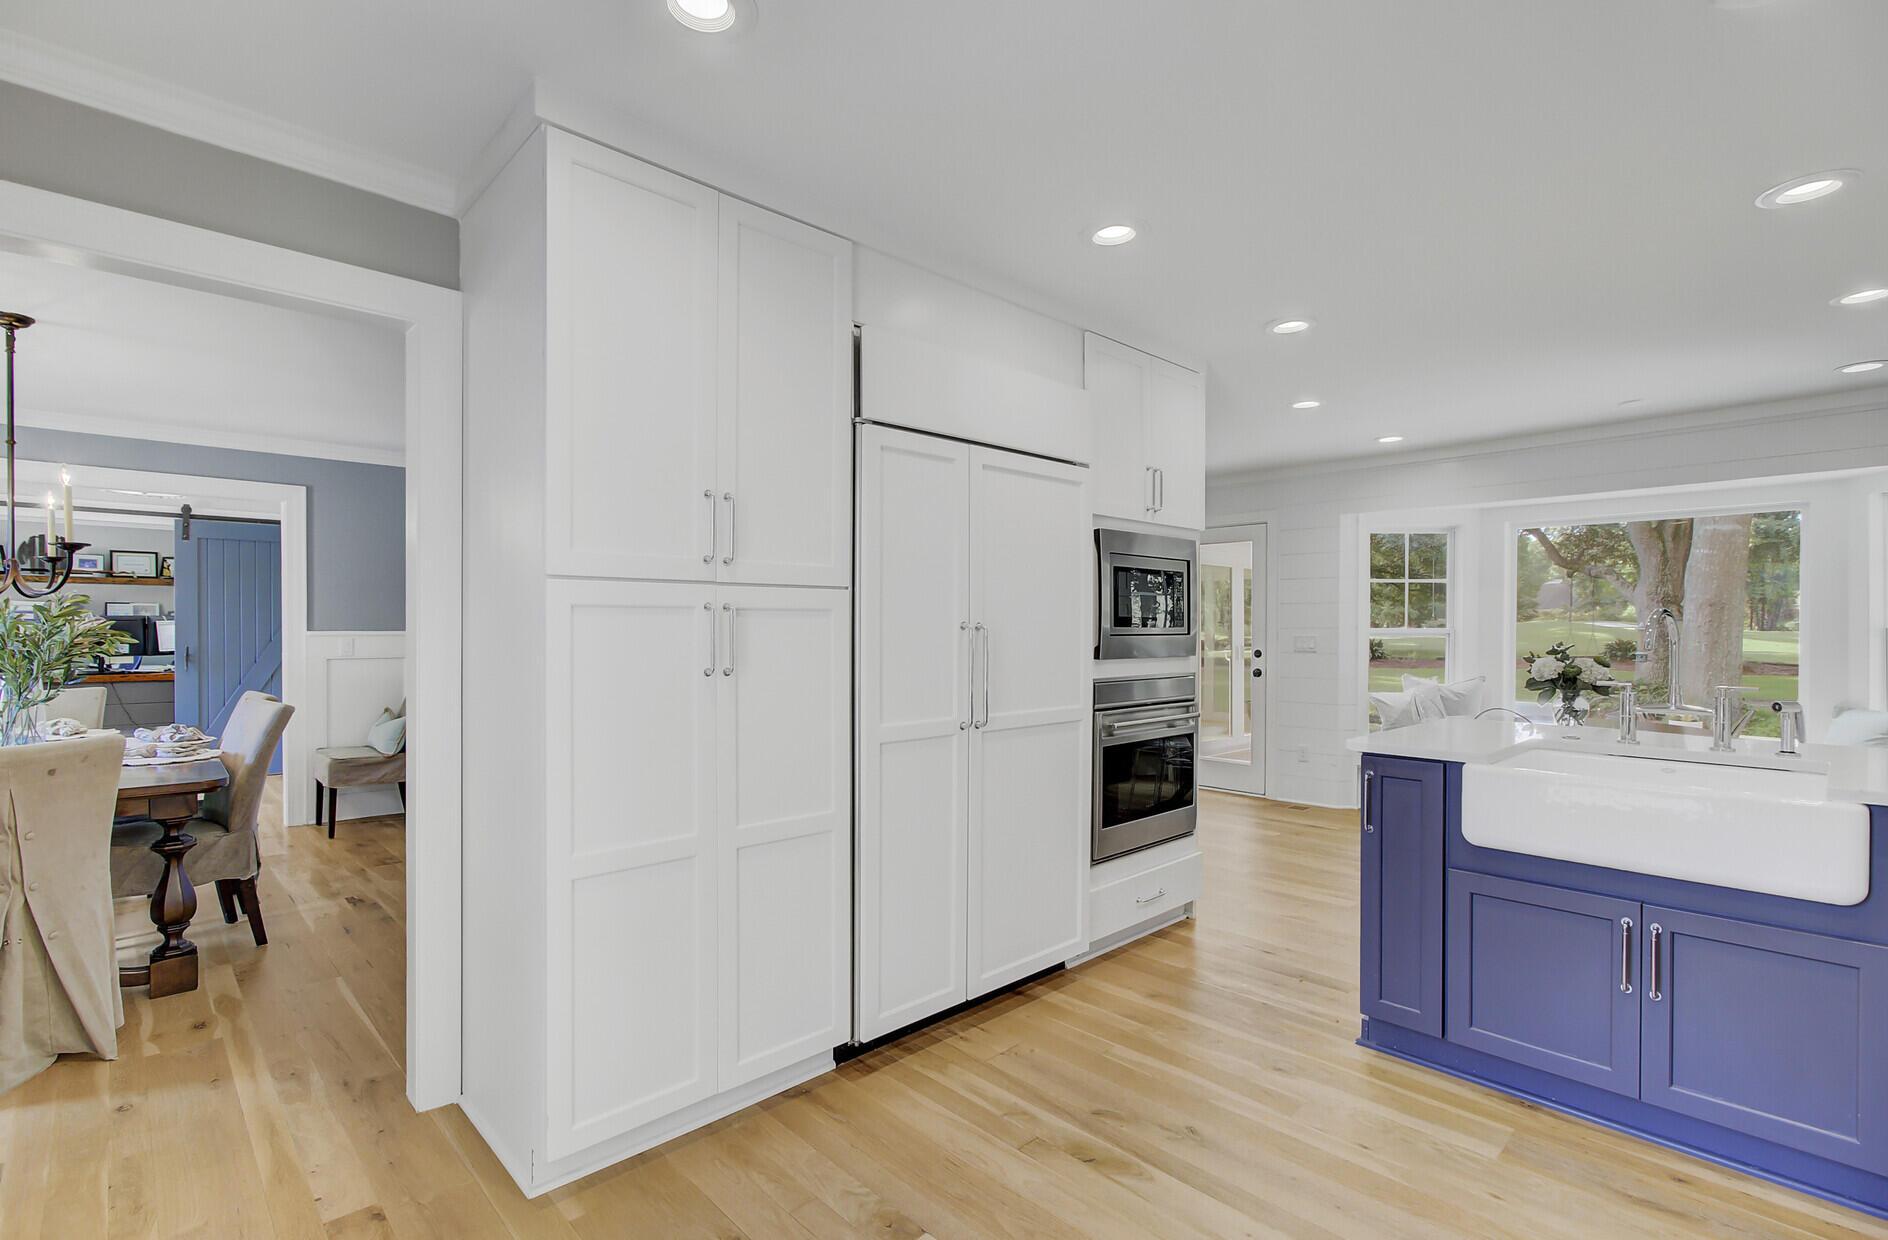 Snee Farm Homes For Sale - 1129 Deleisseline, Mount Pleasant, SC - 12